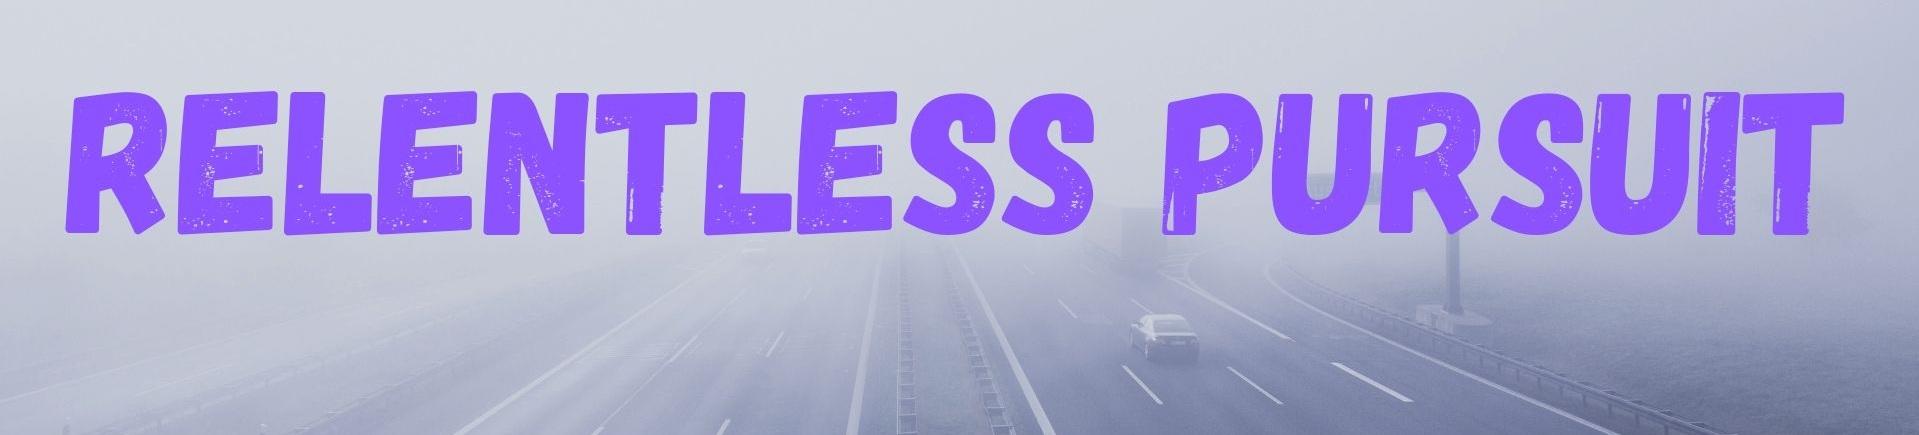 Relentless+pursuit.jpg